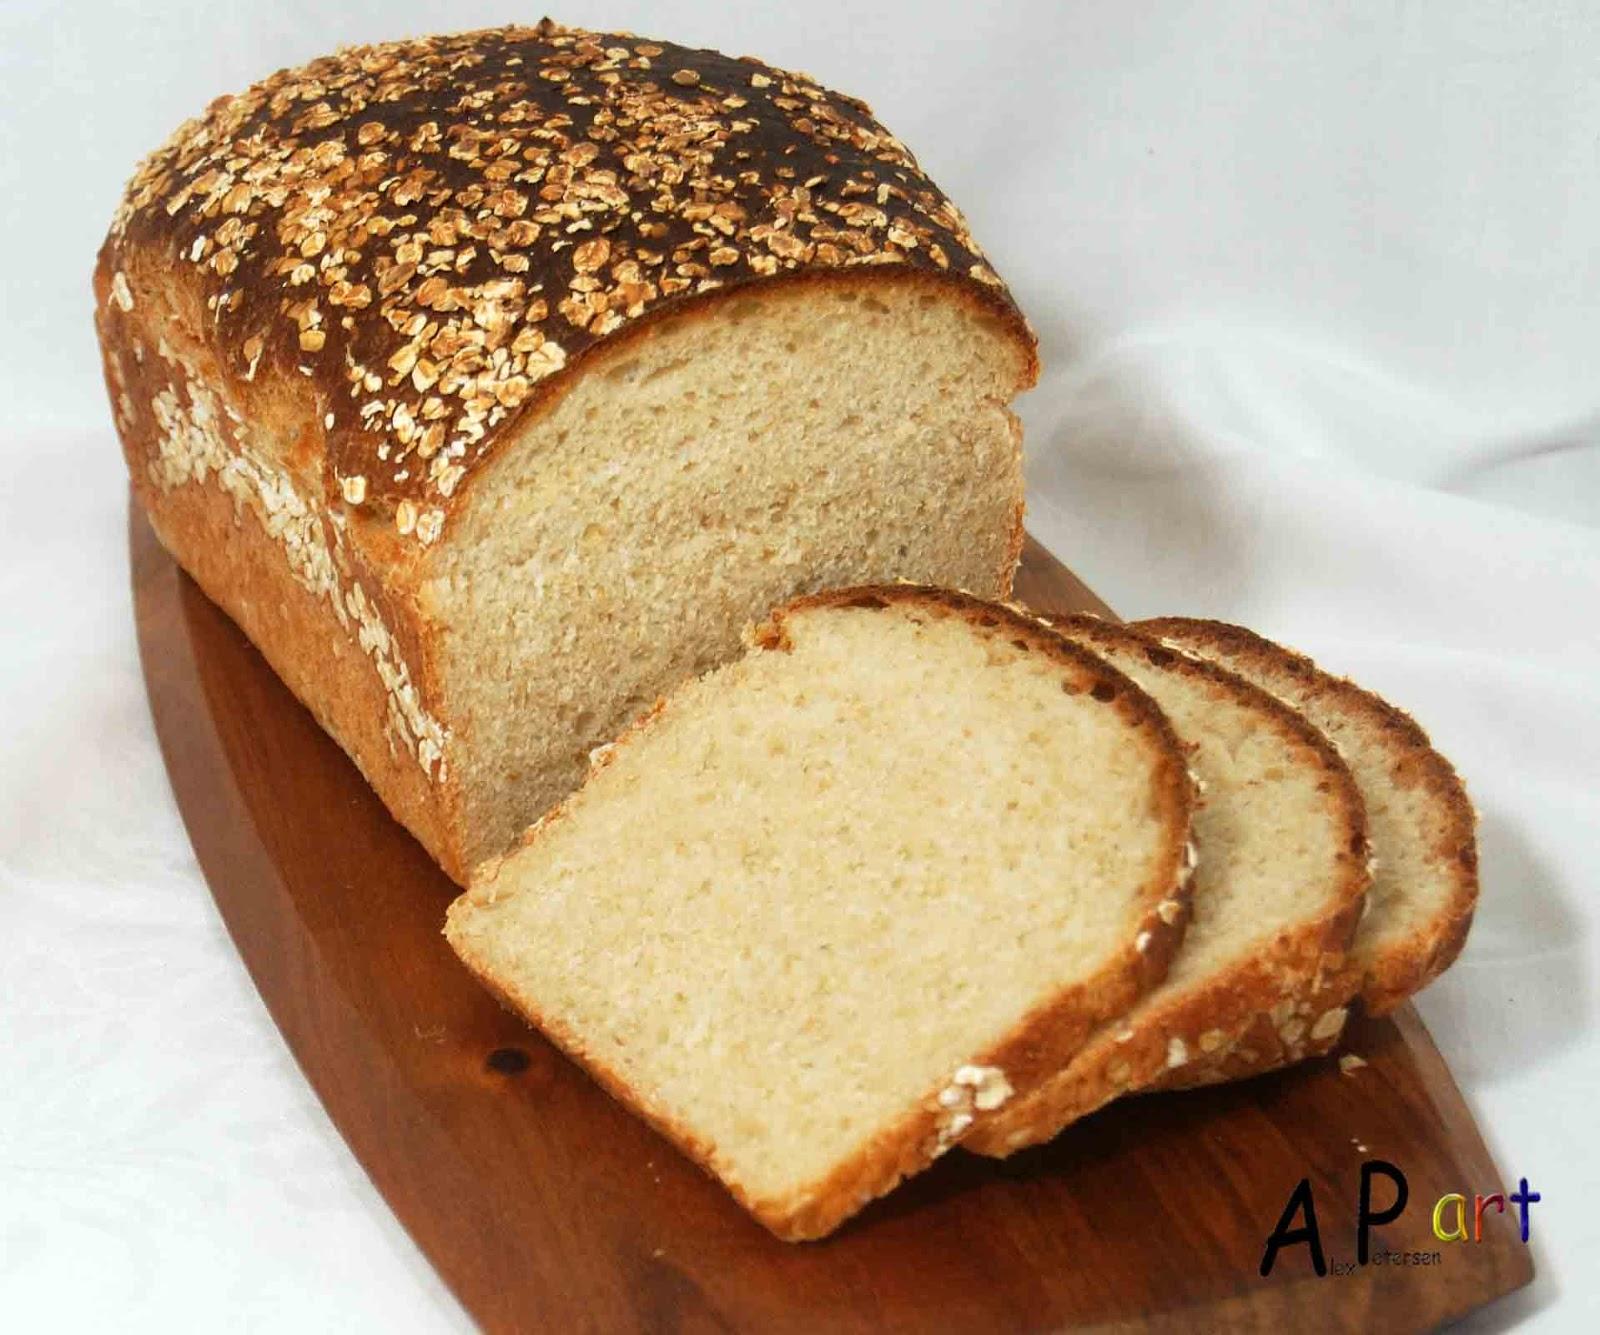 Alex the Contemporary Culinarian: Buttermilk and Oatmeal Bread